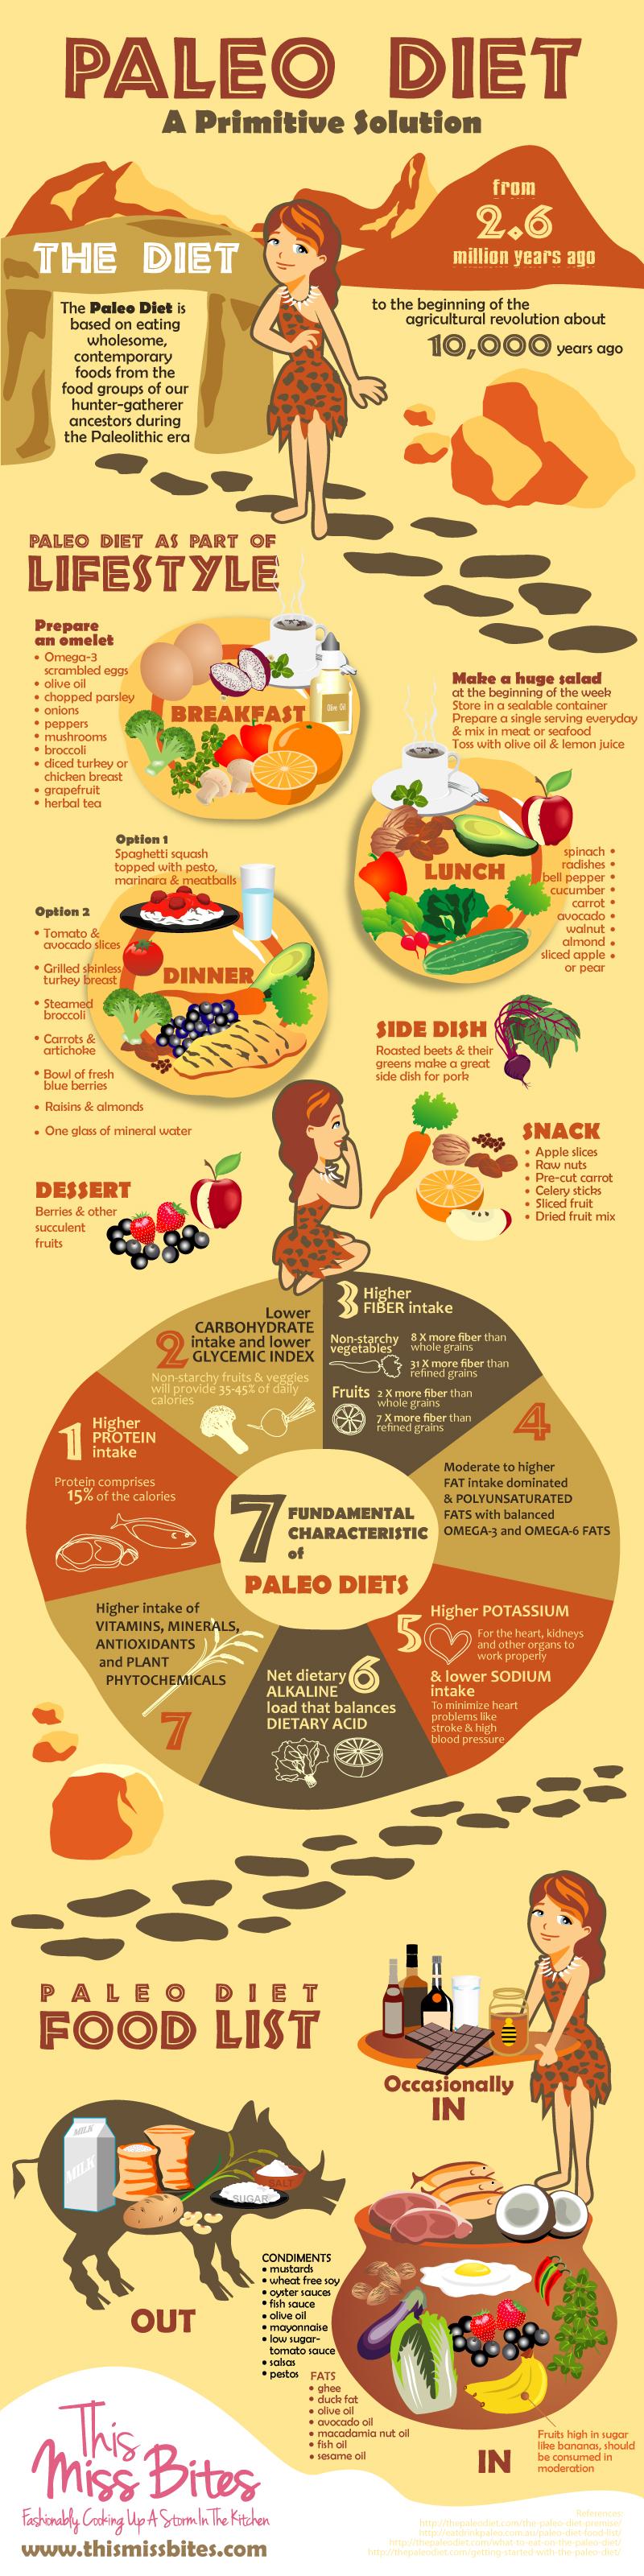 the paleo diet grocery list - dr. sam robbins